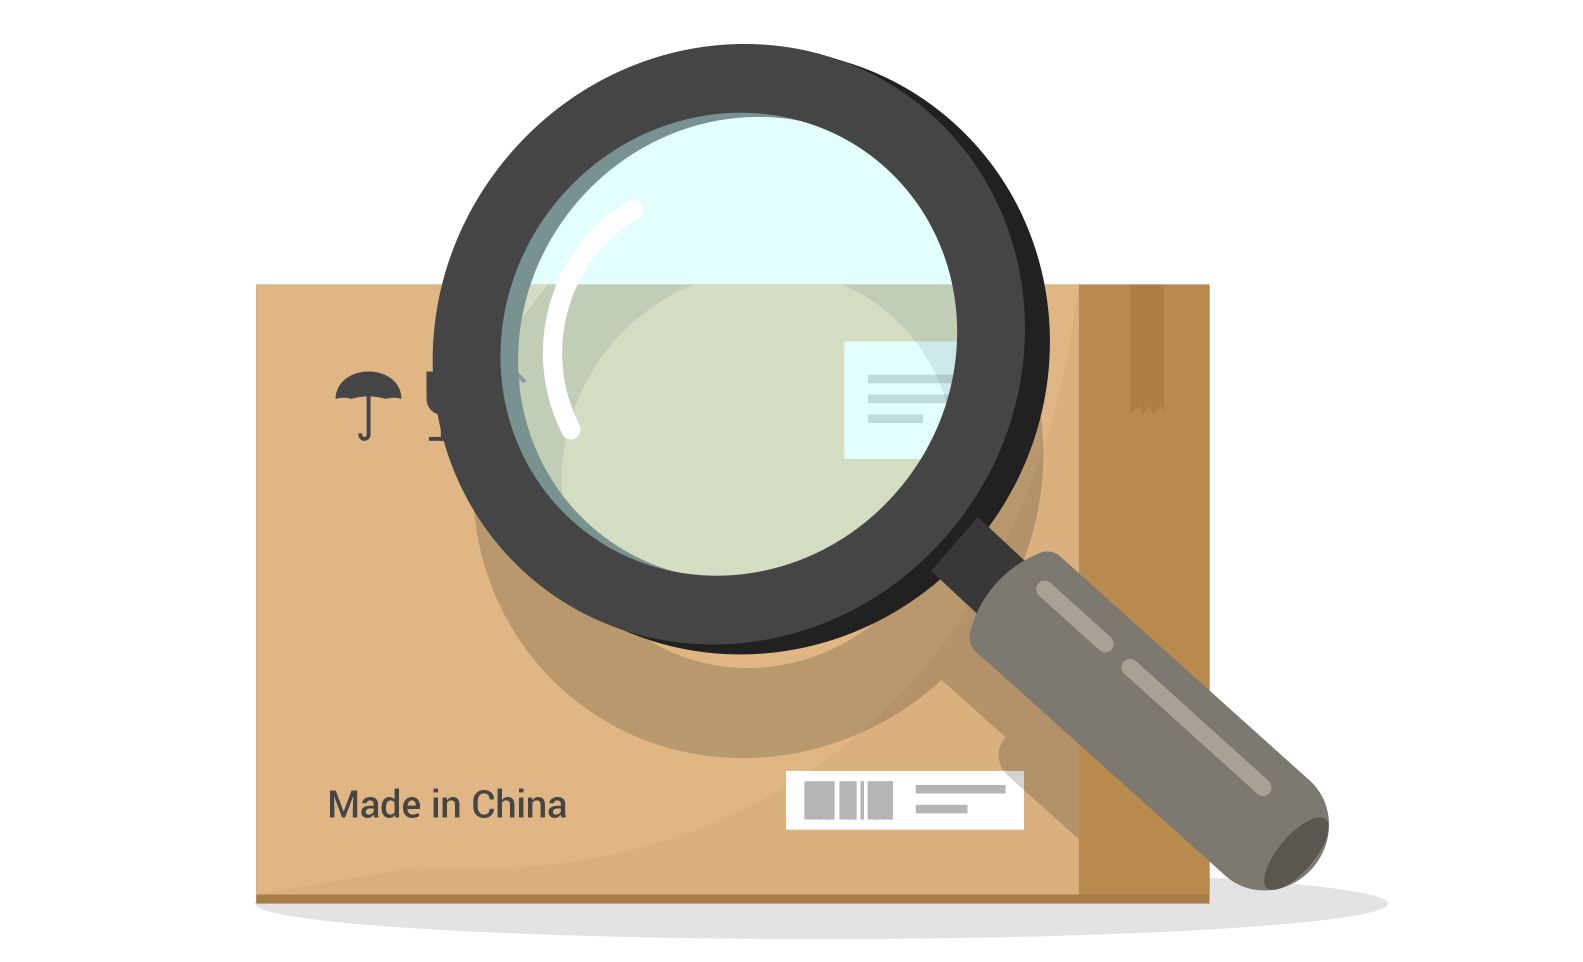 Recherche fournisseur chinois